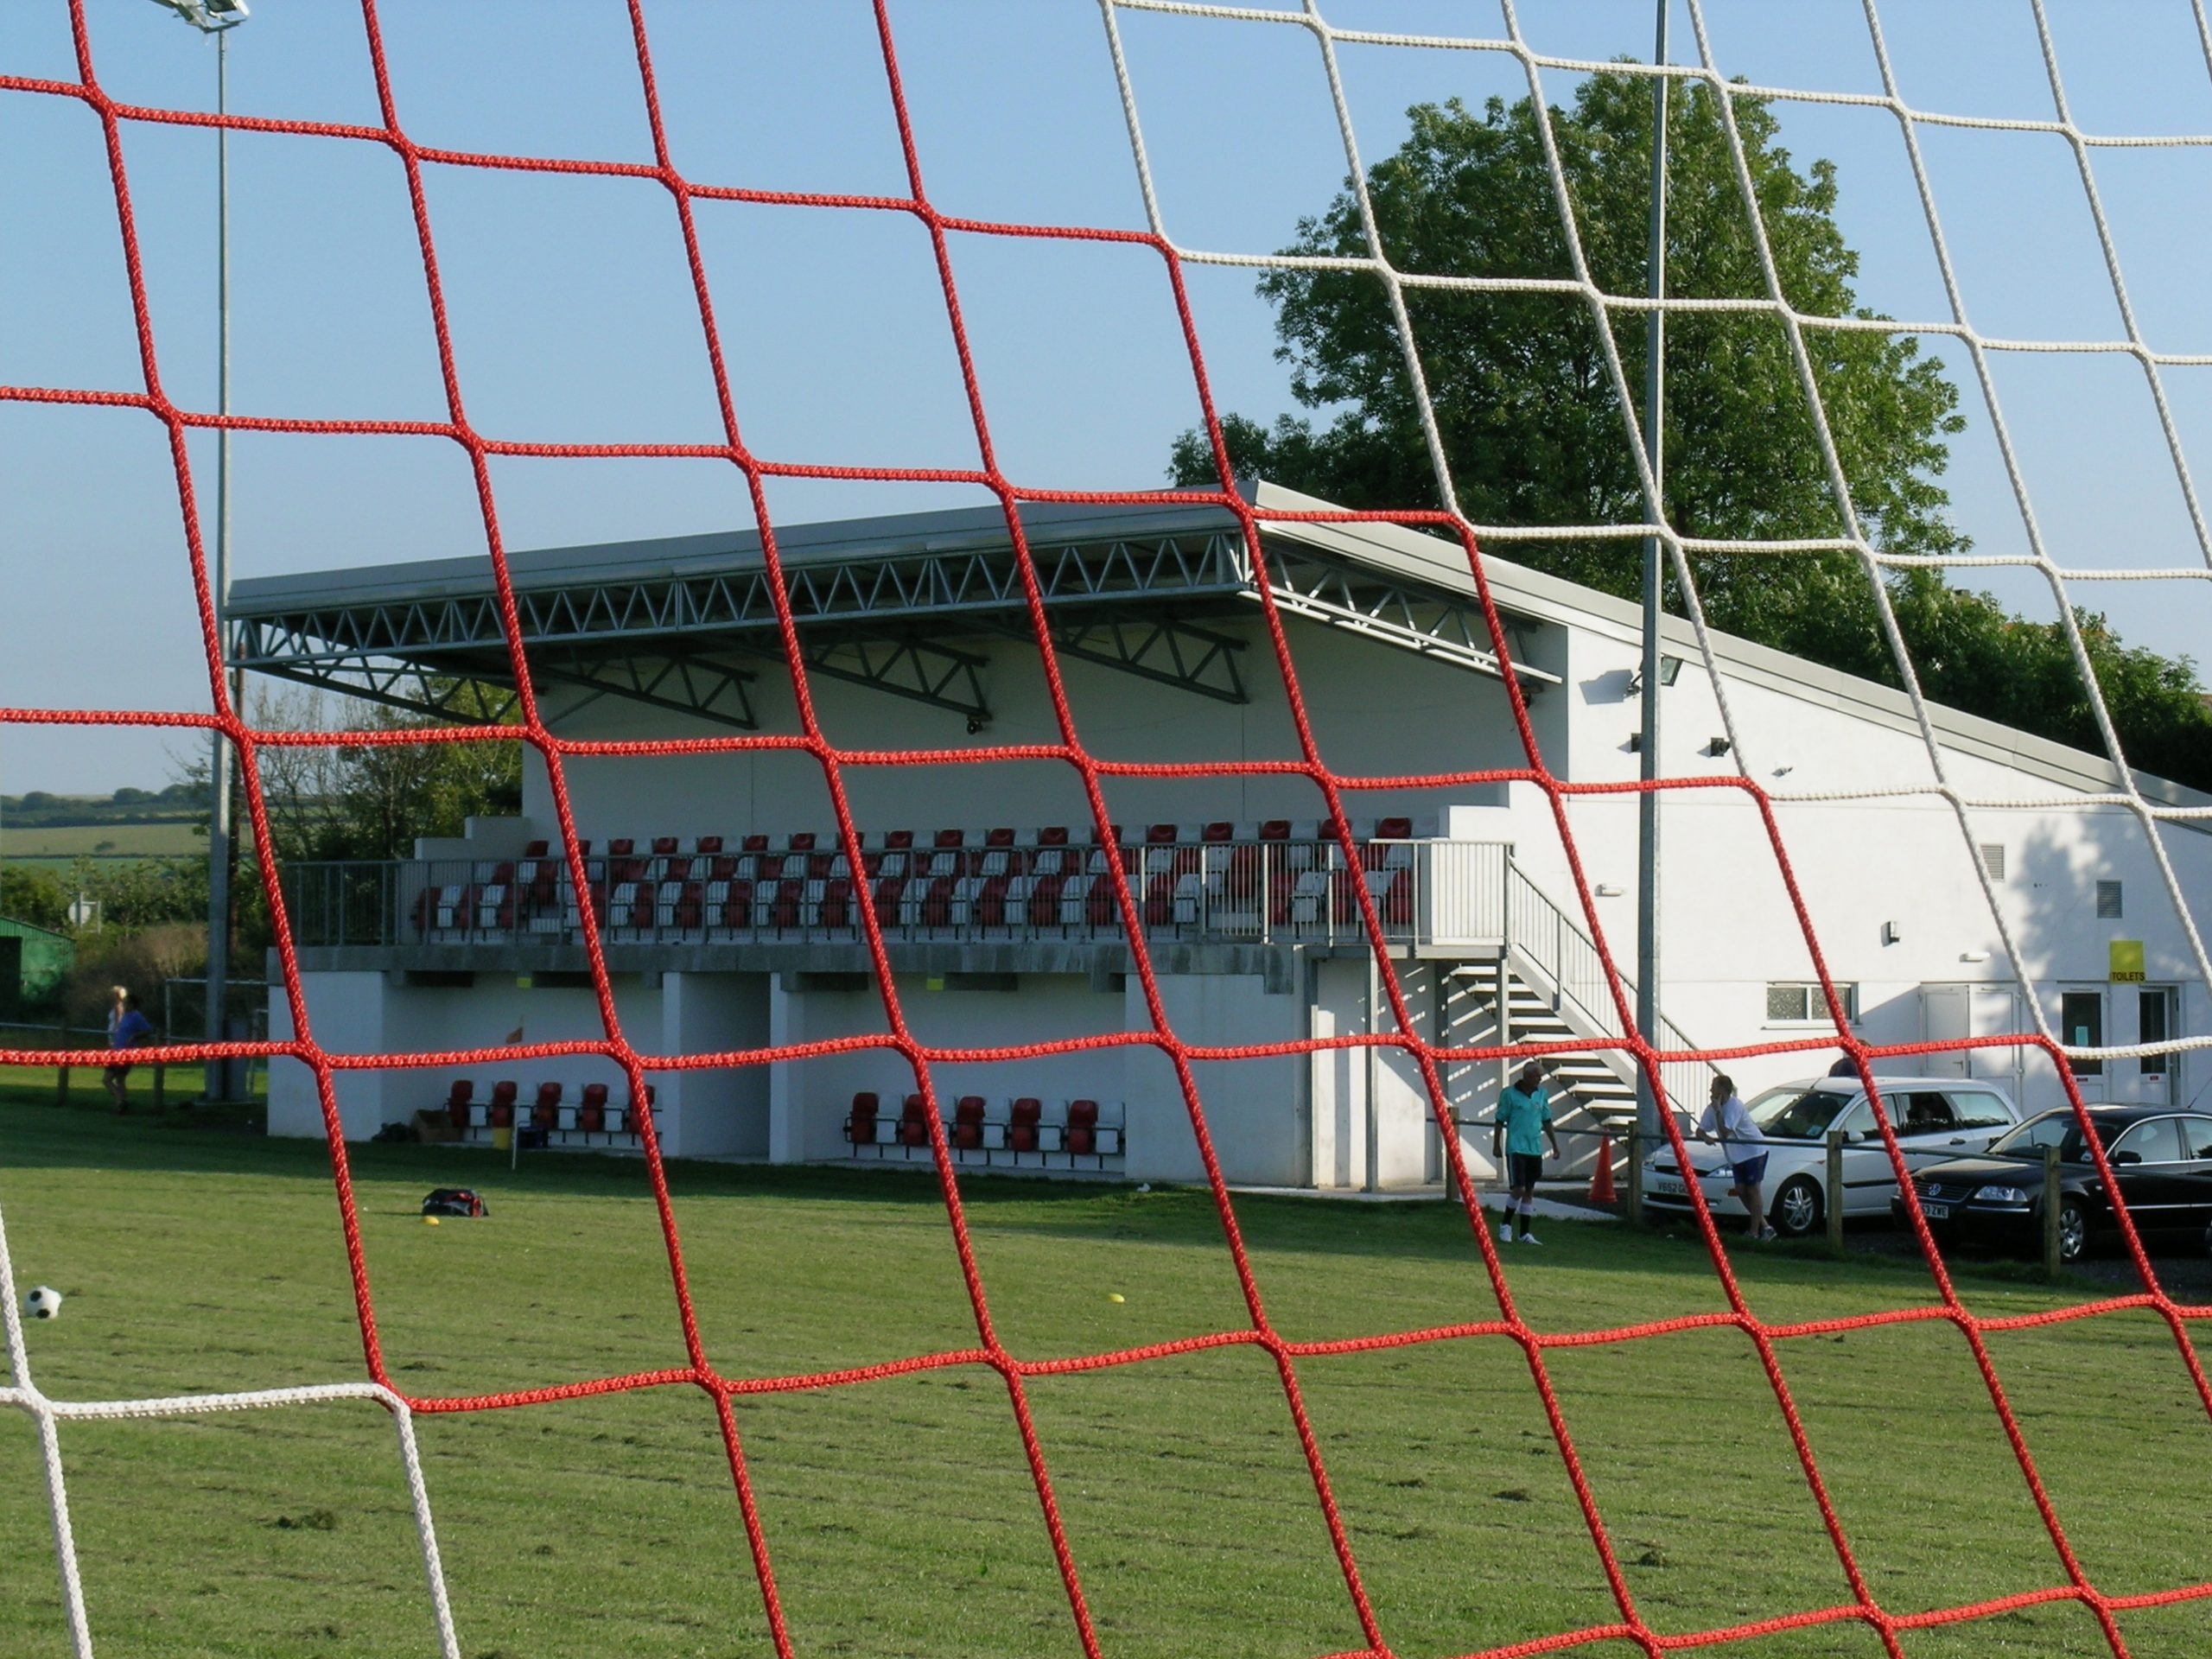 Bodieve Park